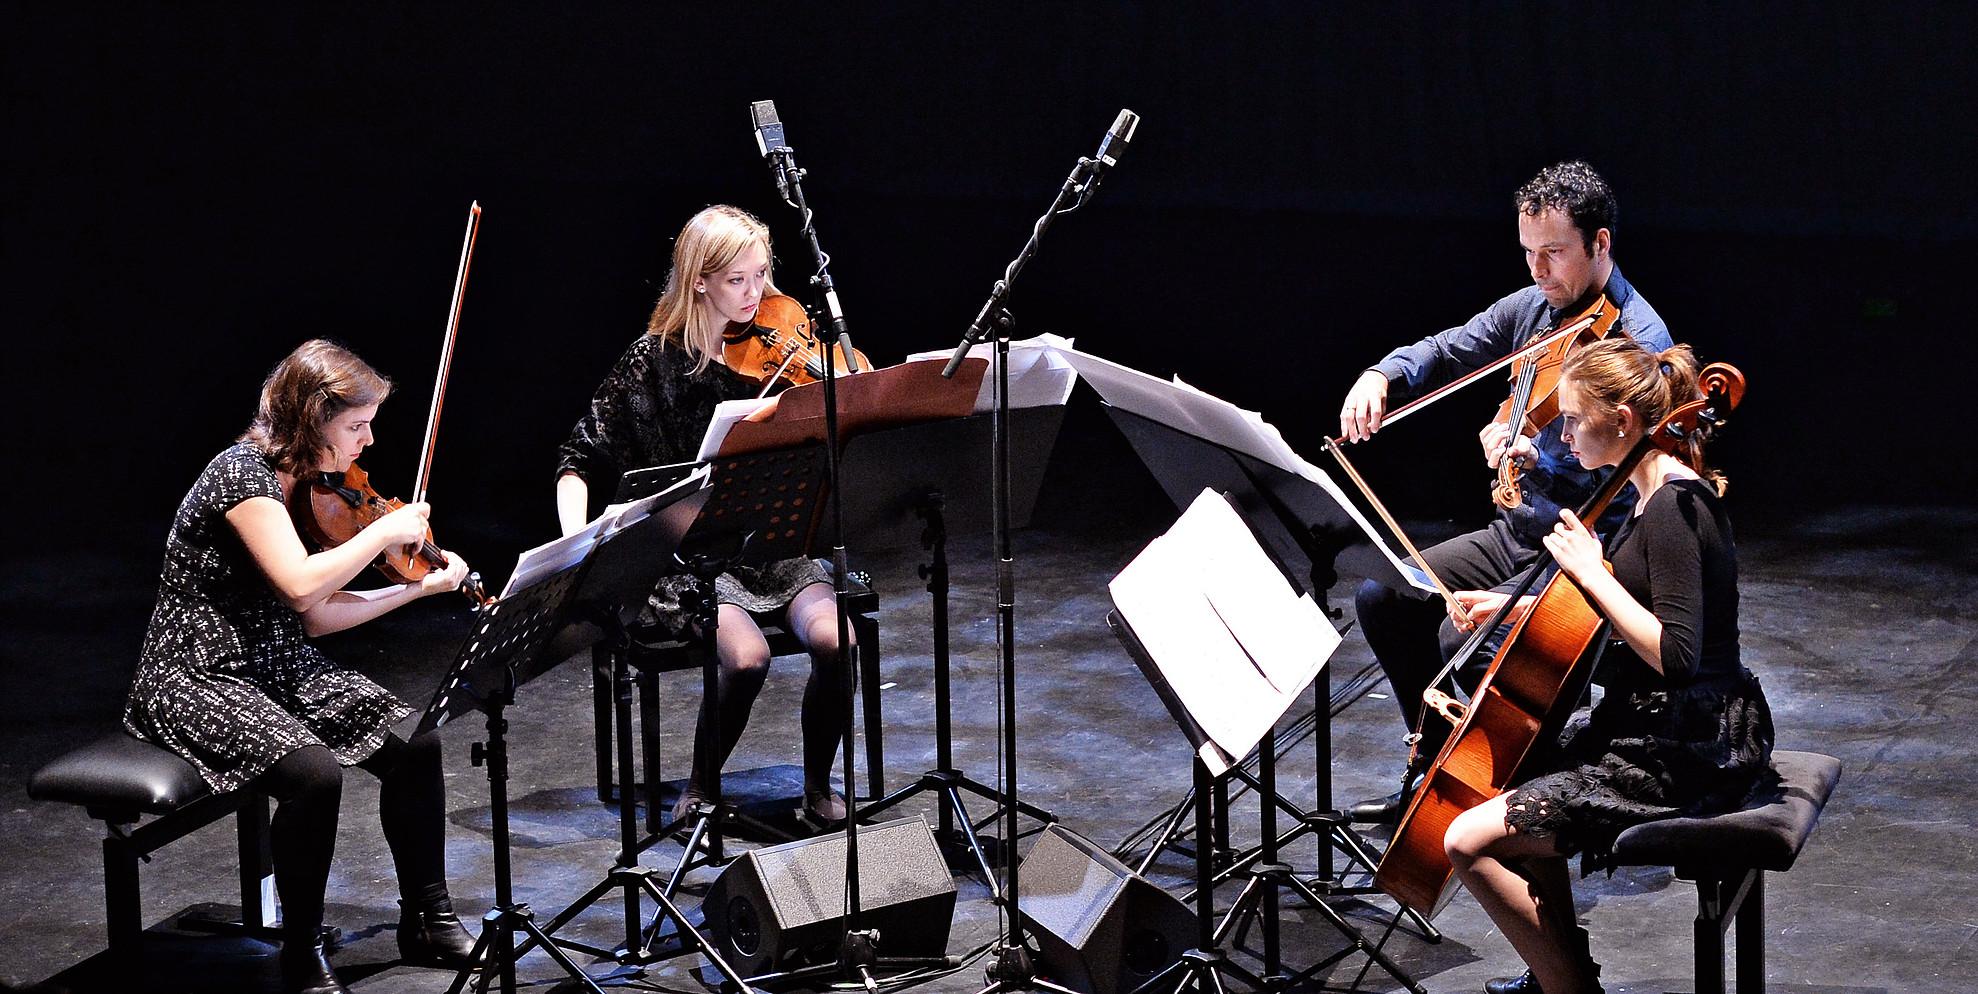 2017 Ensembles in Residence / Solistas & Conjuntos de Residencia